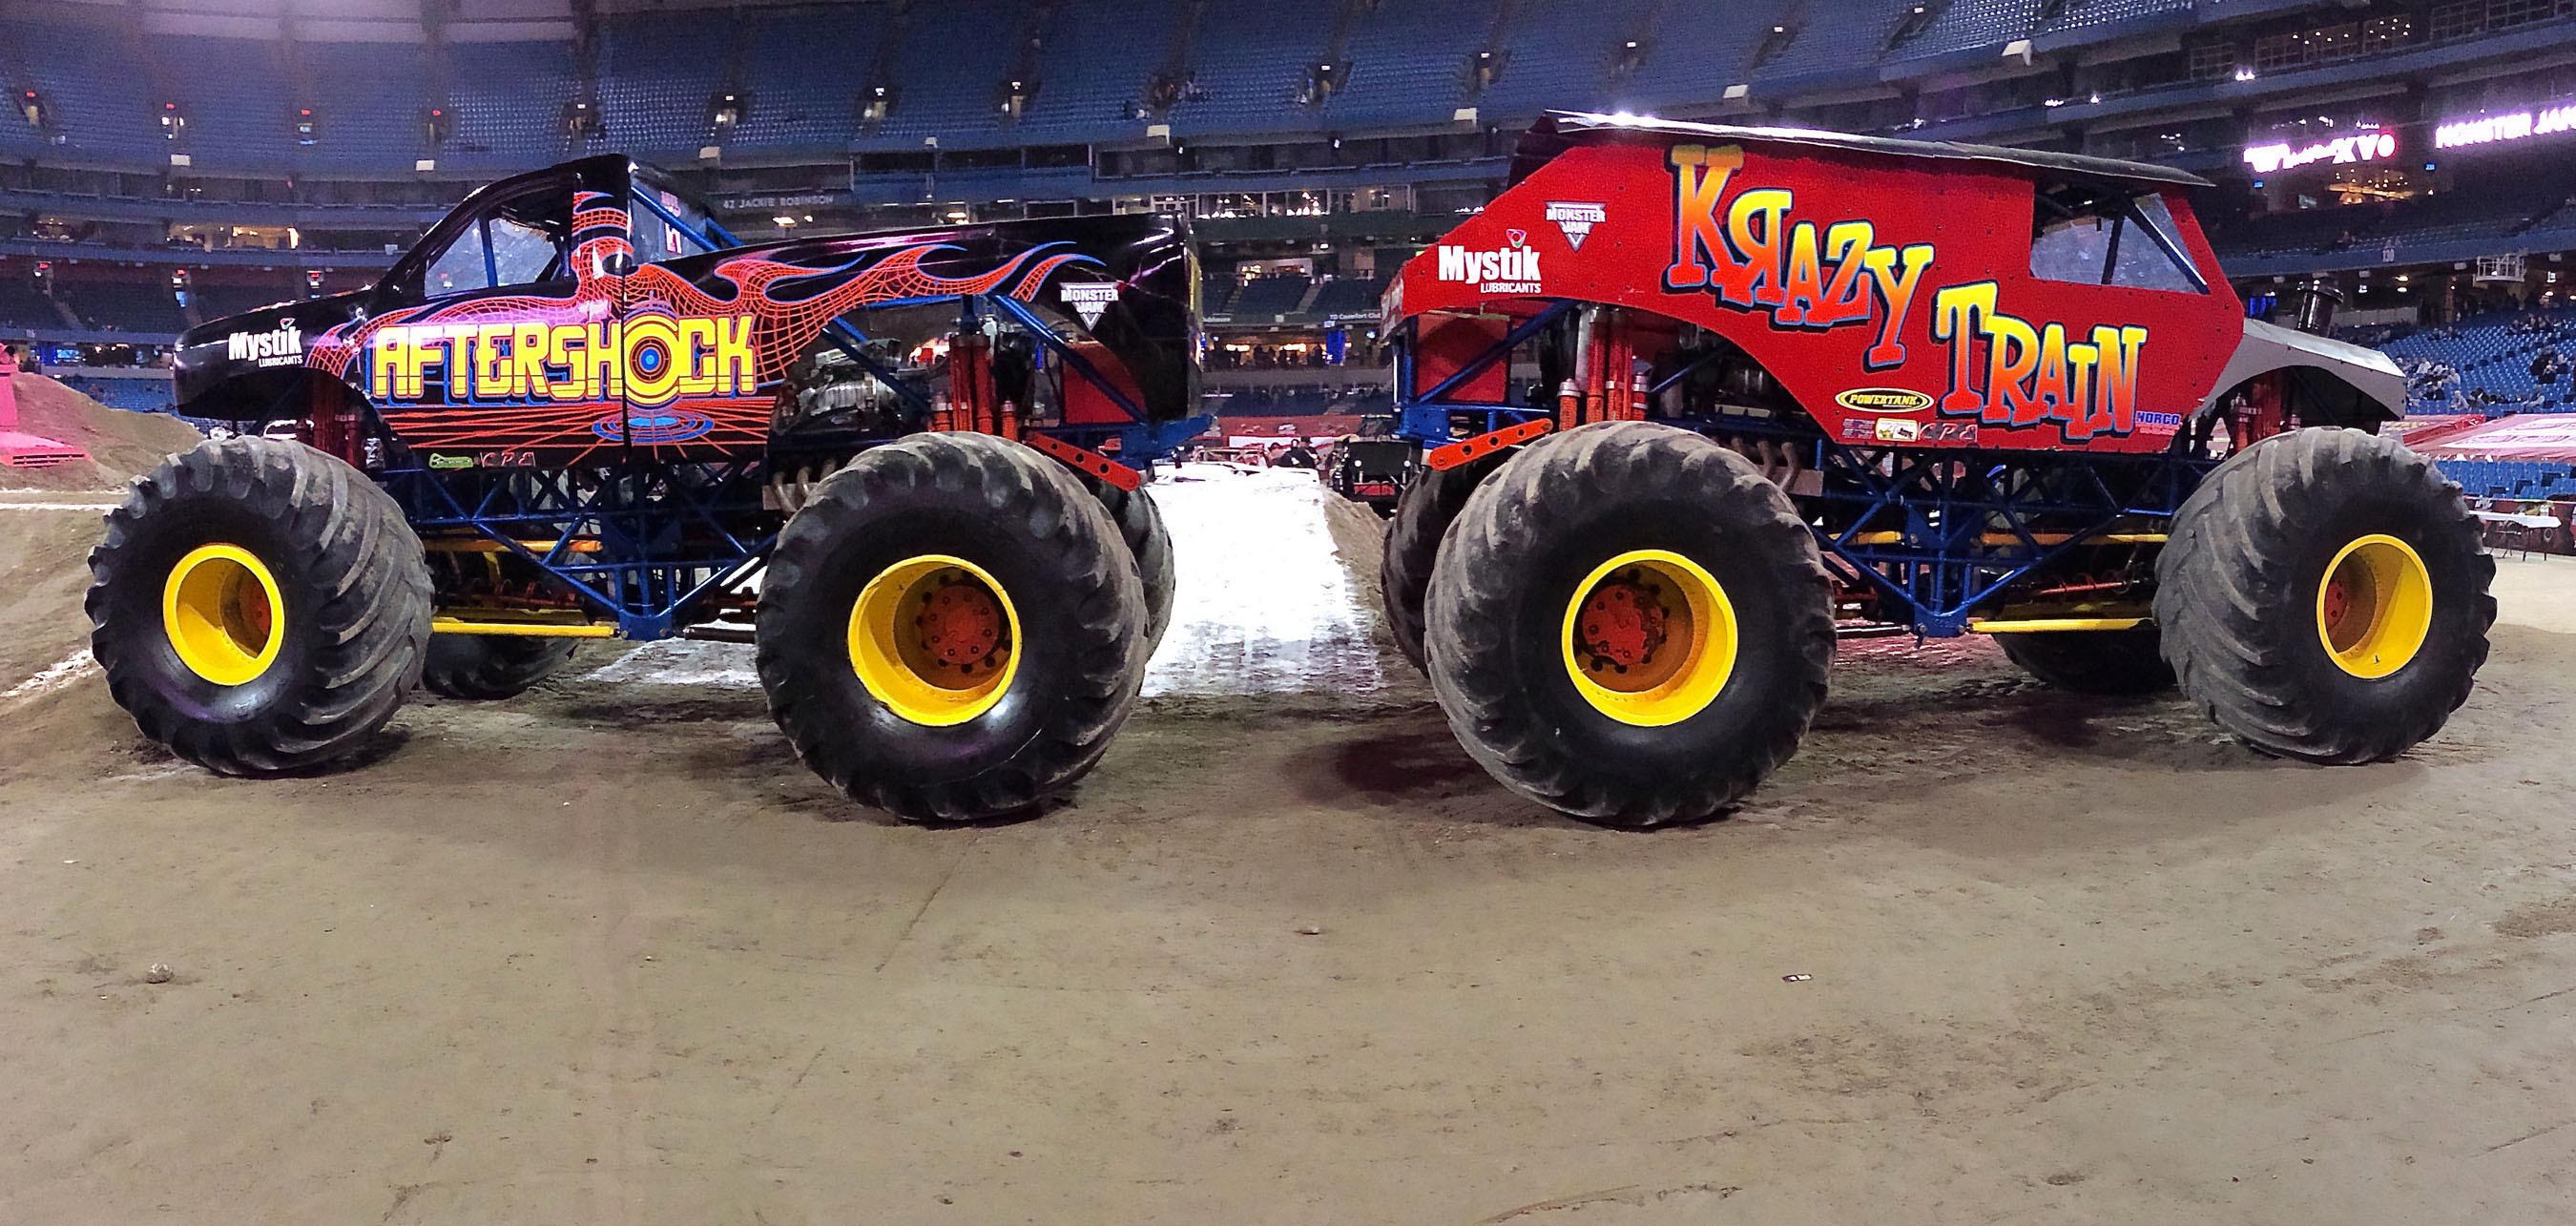 Mystik(R) Lubricants Partners With AfterShock Monster Truck.  (PRNewsFoto/Mystik Lubricants)